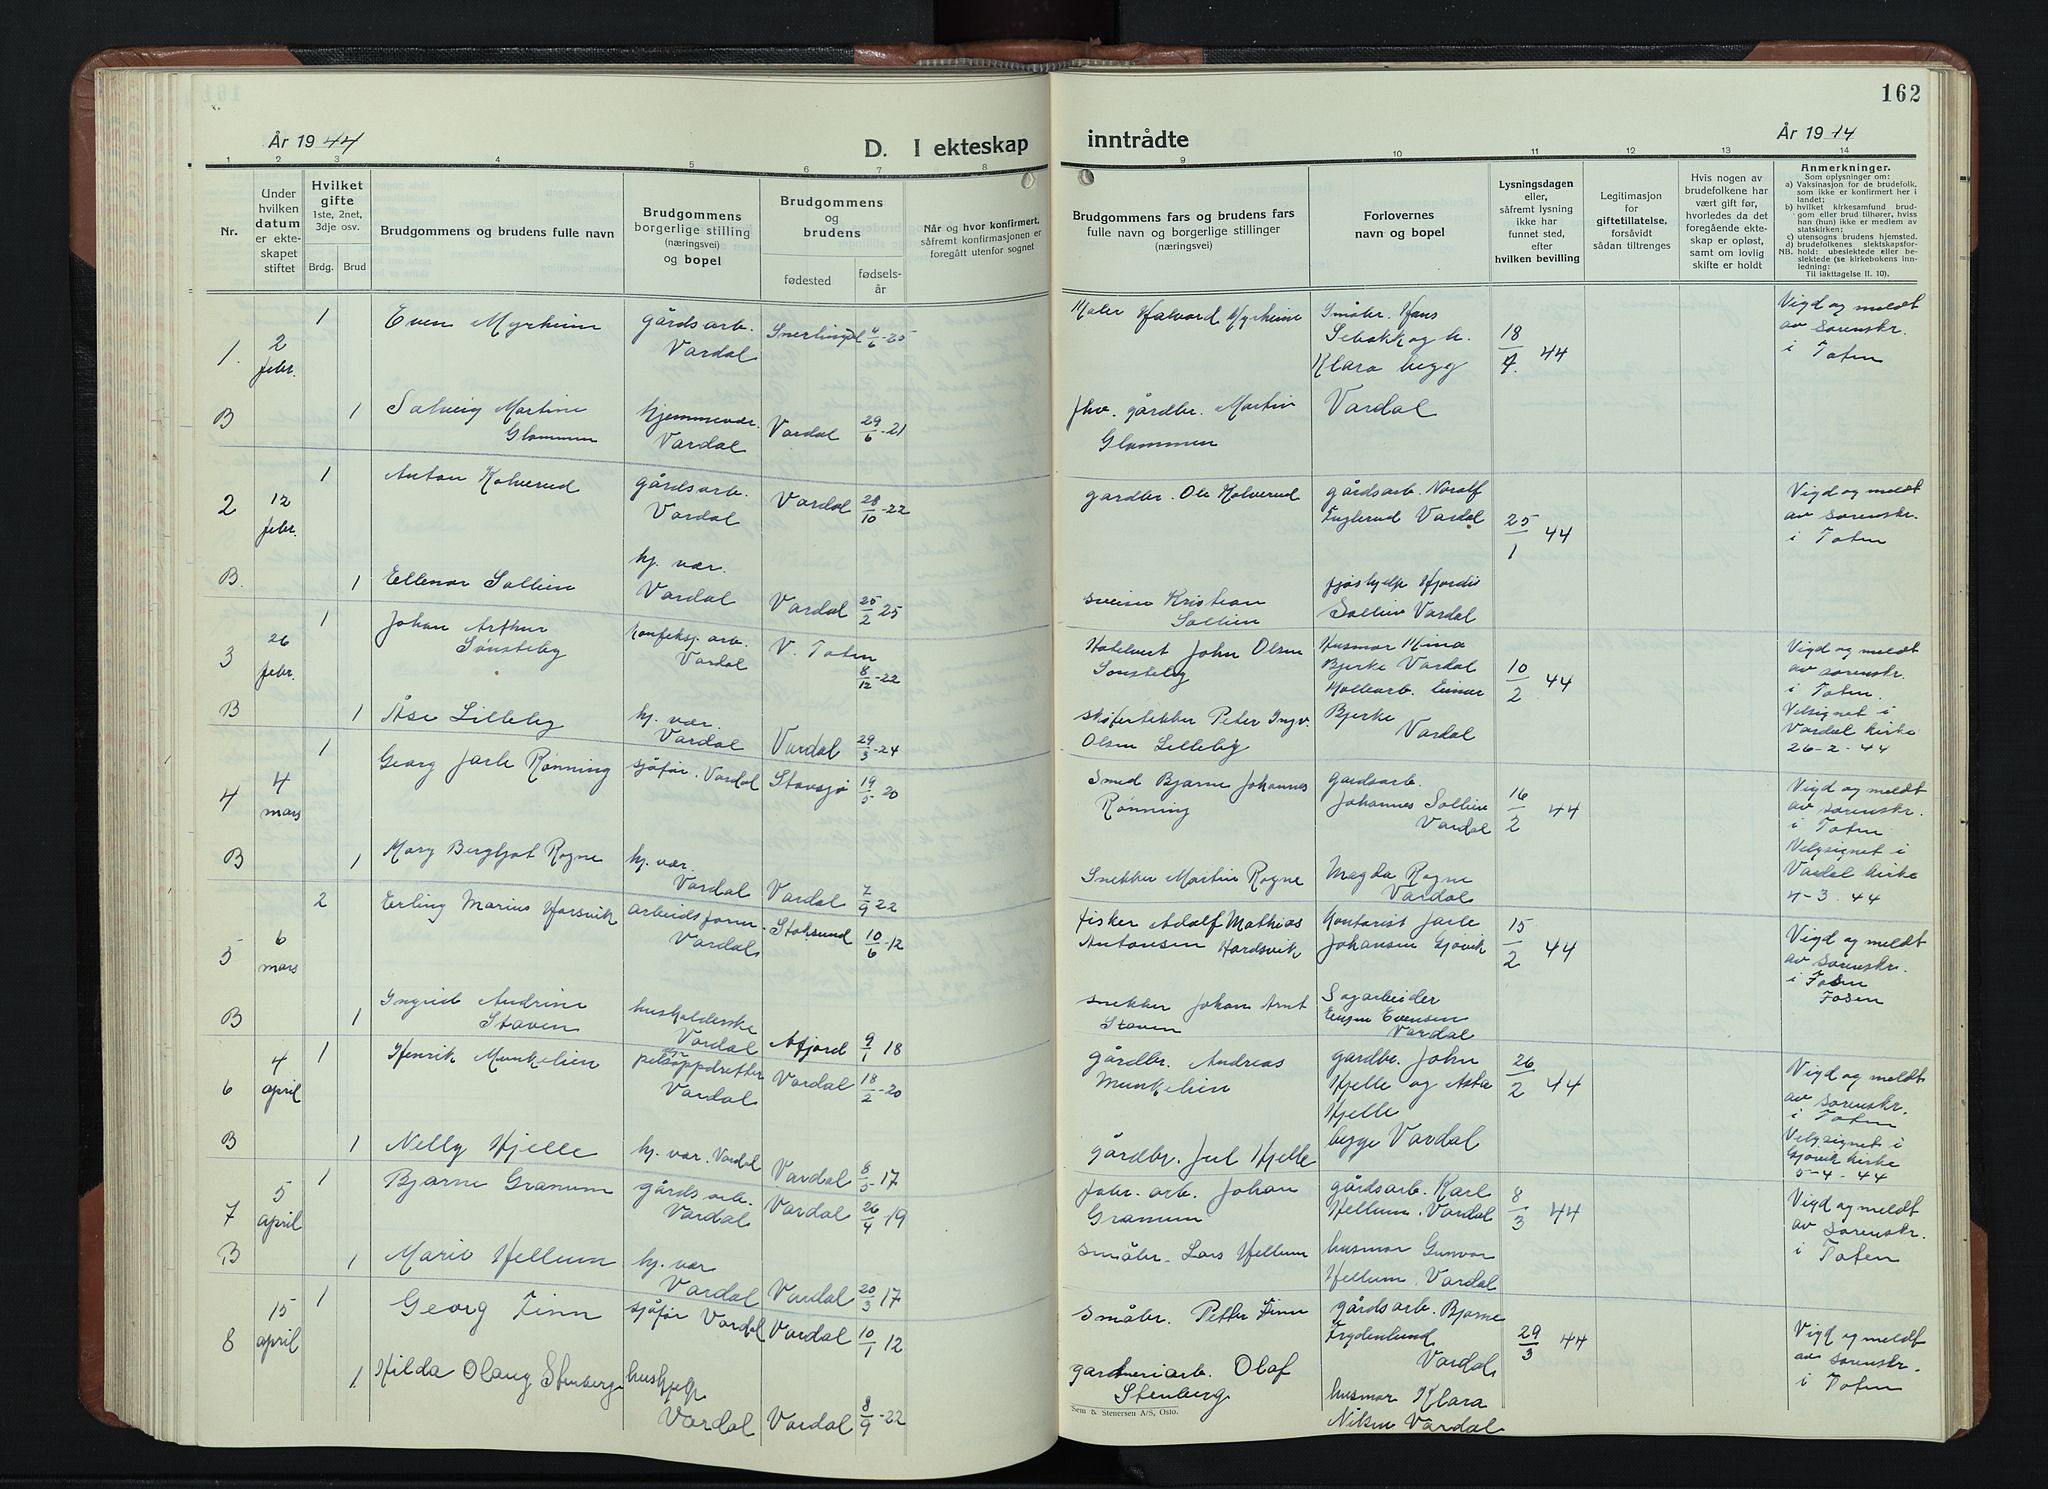 SAH, Vardal prestekontor, H/Ha/Hab/L0018: Klokkerbok nr. 18, 1931-1951, s. 162